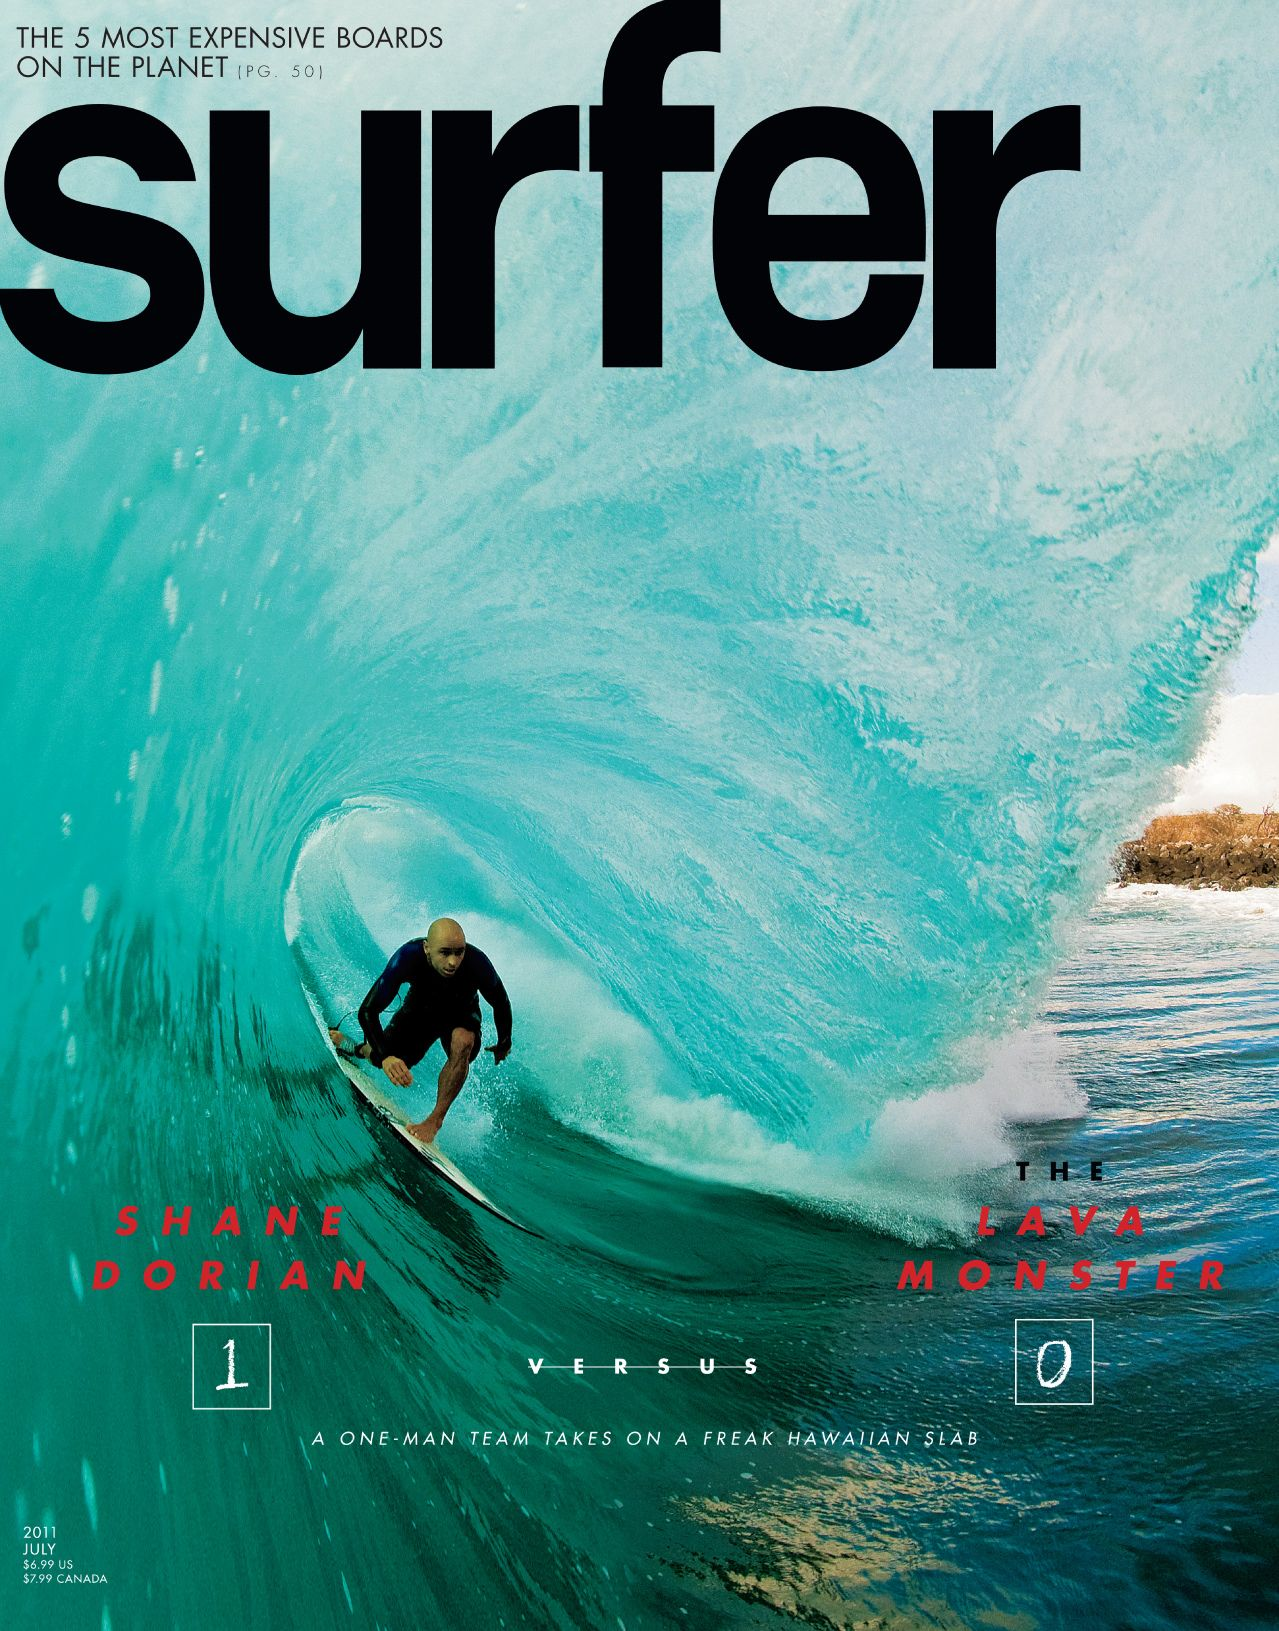 Surfer Magazine Surf News Fantasy Surfer Photos Video And Forecasting Surfer Magazine Surfing Photos Surfer